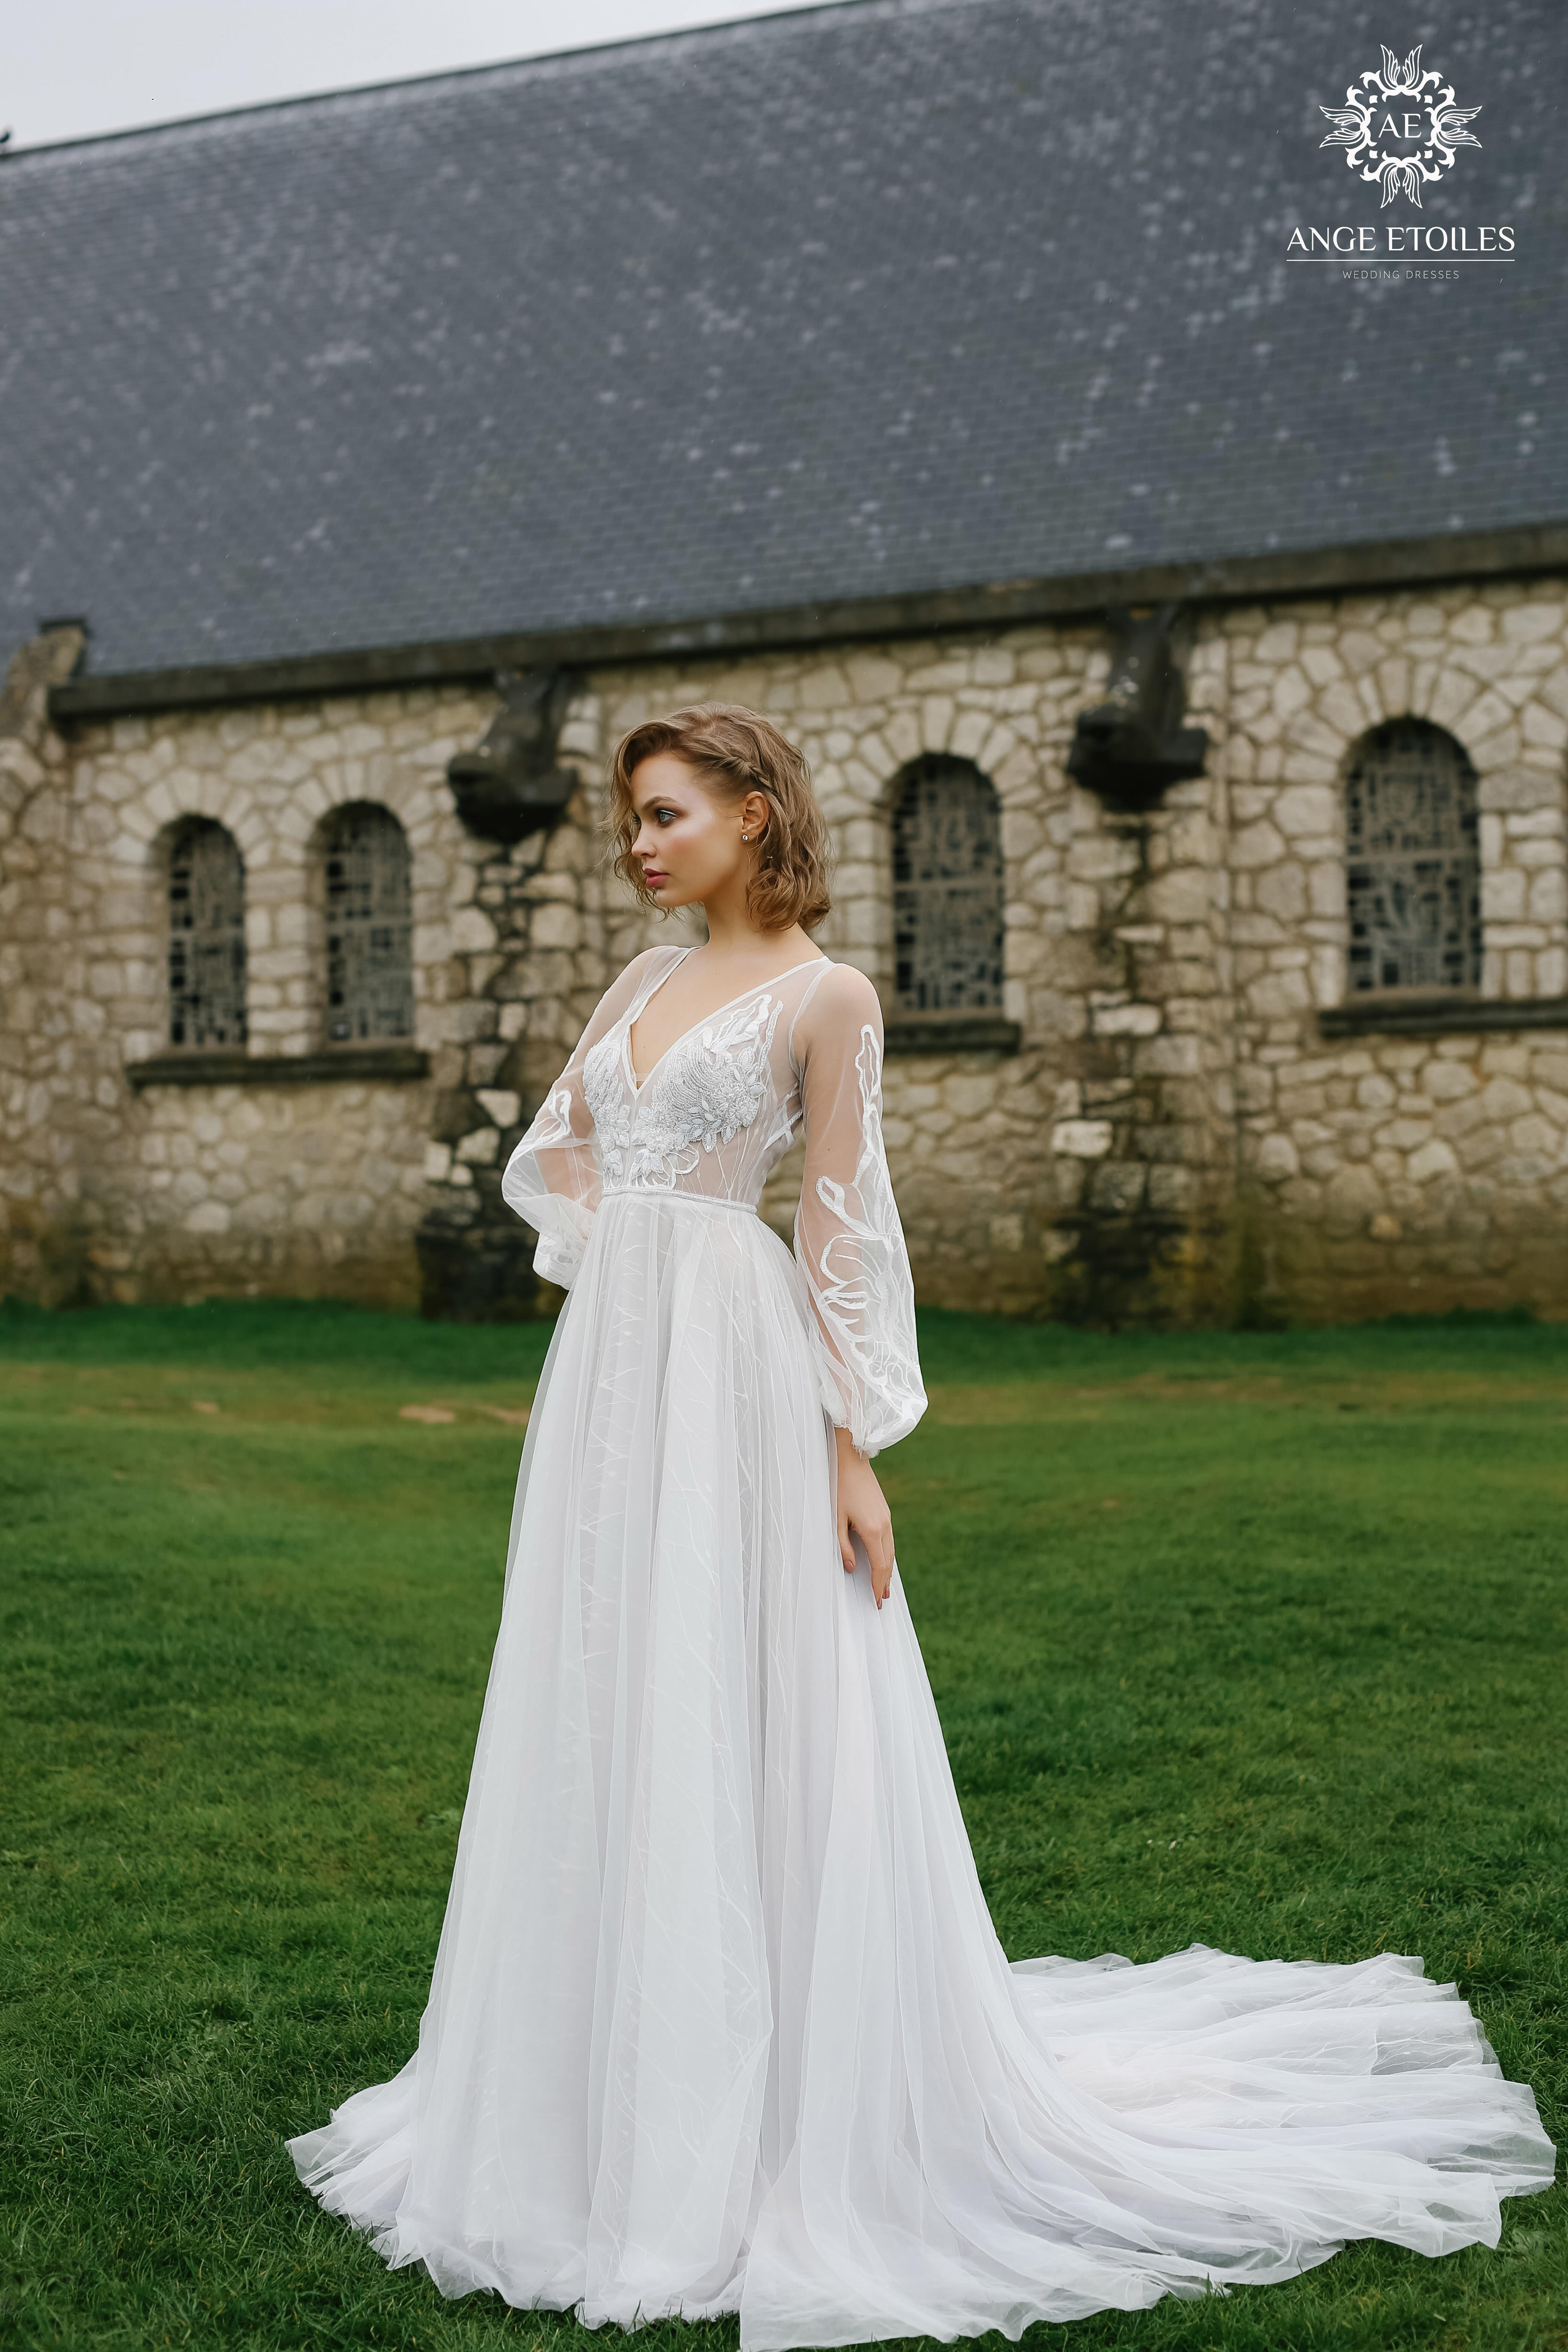 38c73a9dcbaa7 Wedding gown Ange Etoiles Luna | LUXX NOVA